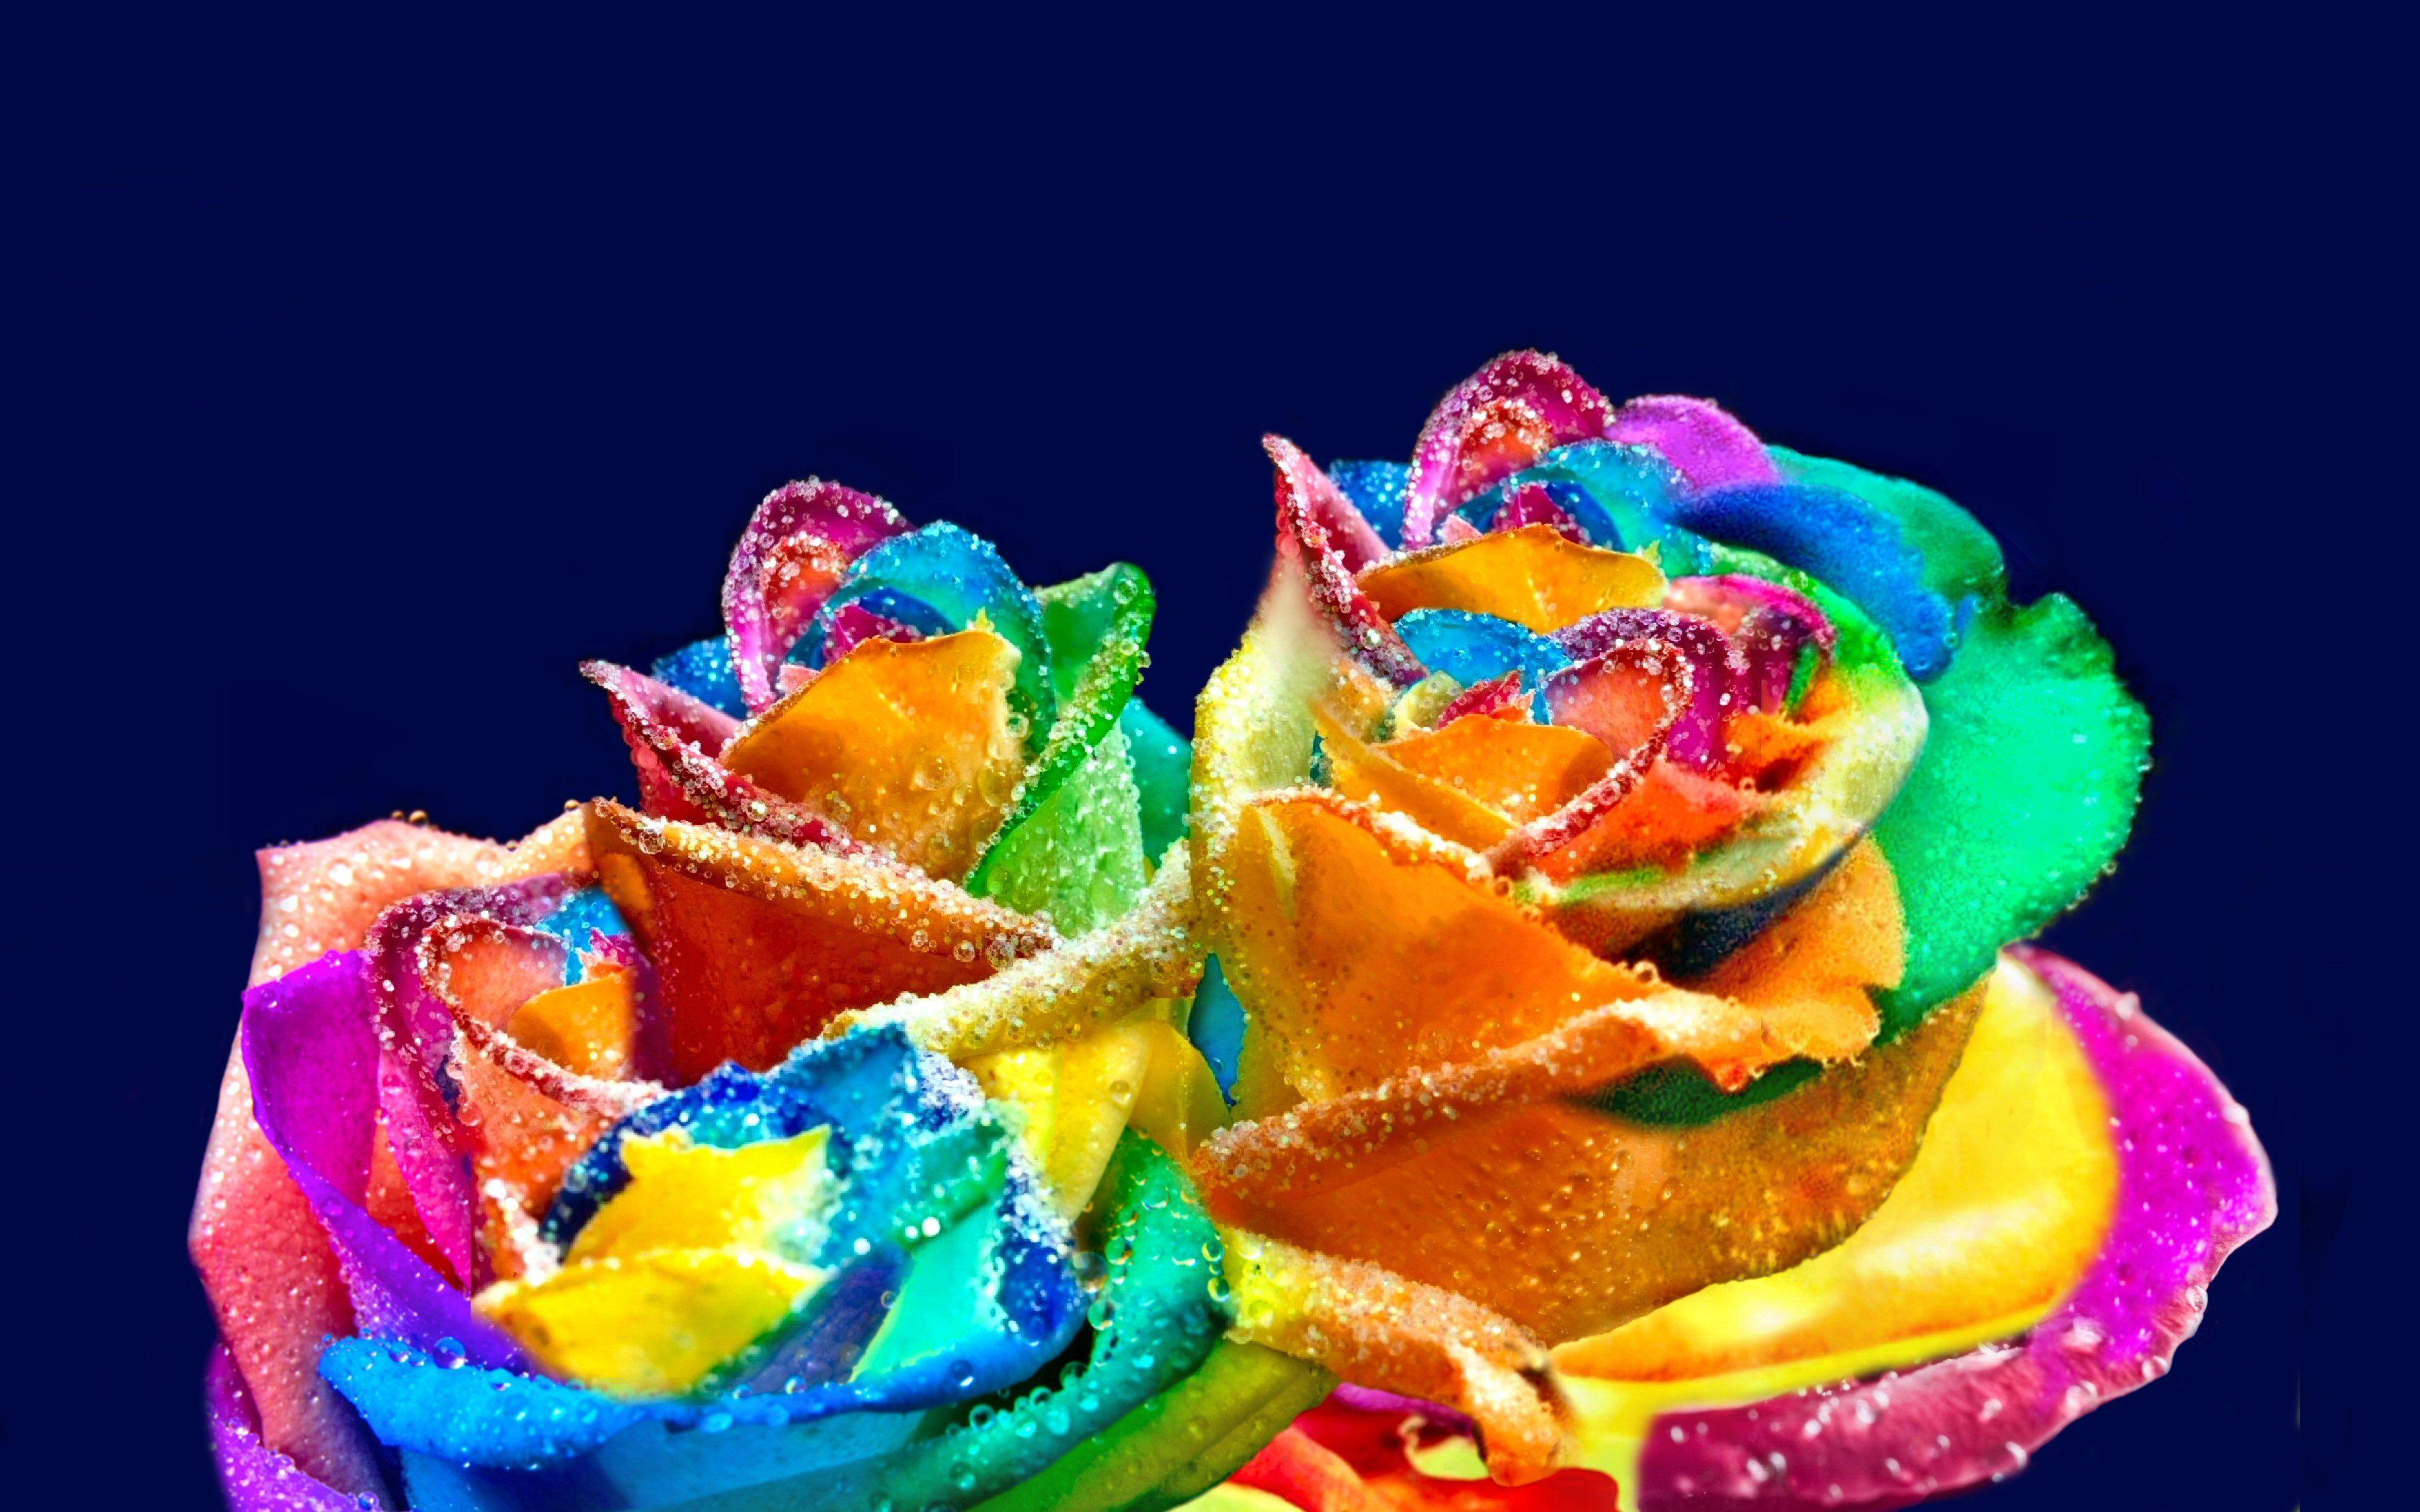 Terra/Natureza Rose  Opus Colorful Drops Nature Highres Papel de Parede